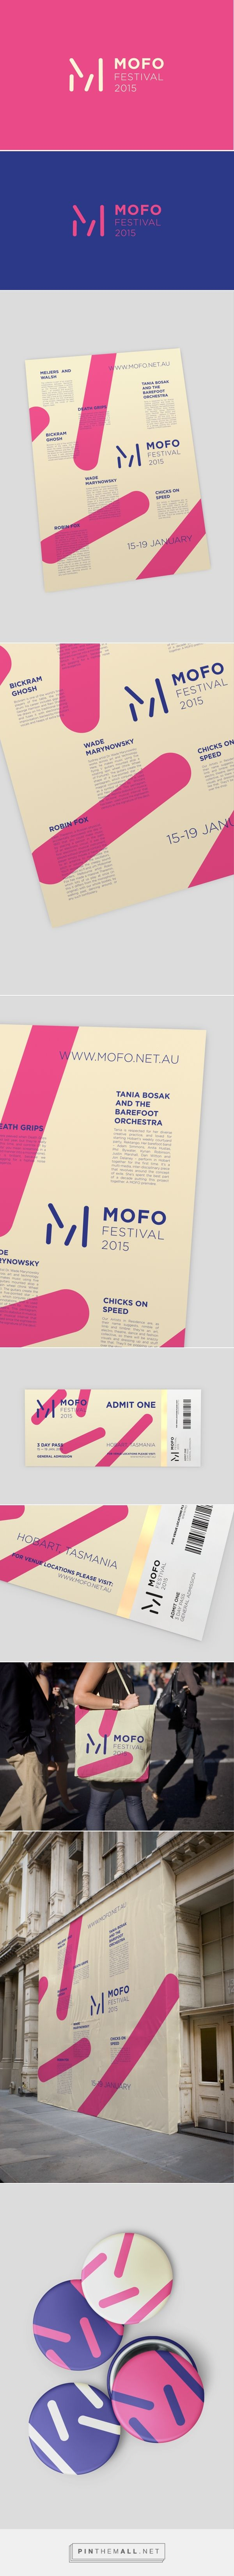 MOFO Festival by Harley Jackman